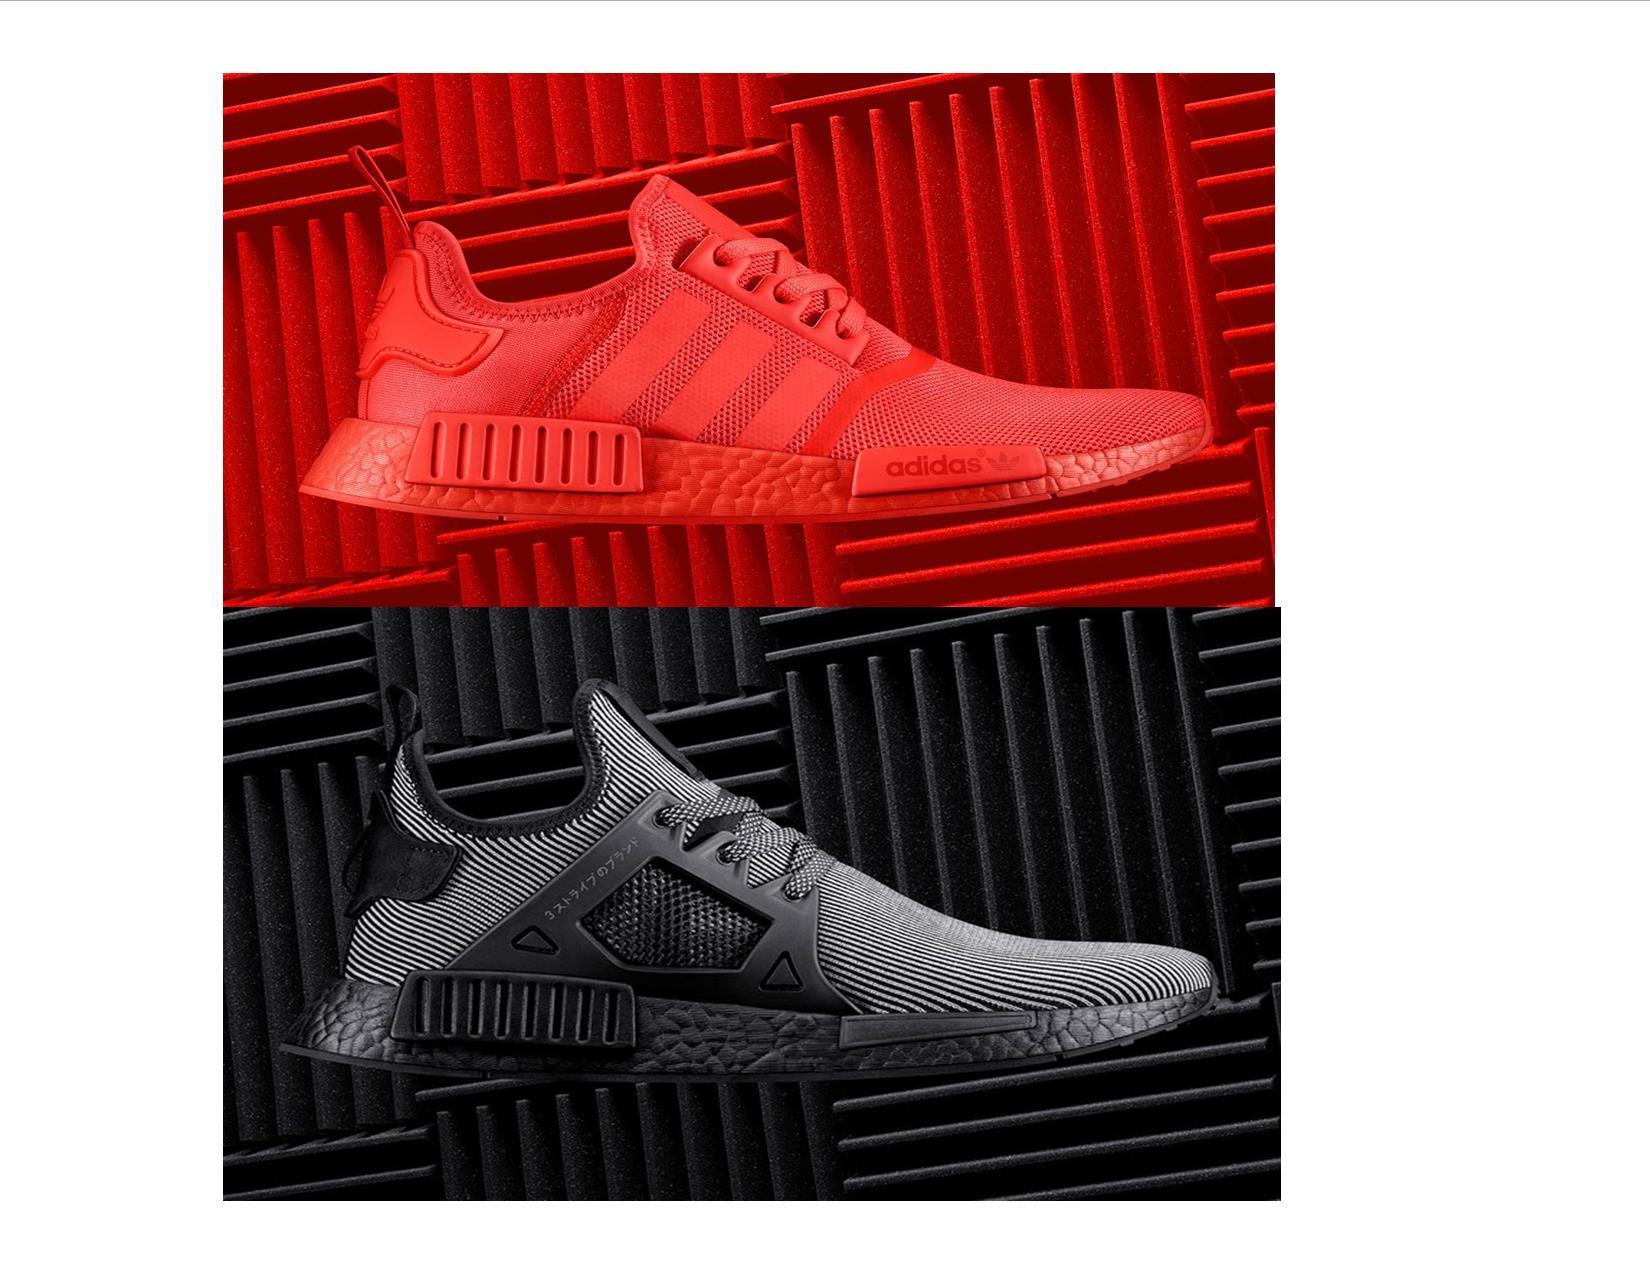 af58b03c3dce7 Adidas NMD Solar Red   Triple Black XR1 Drop Soon – Housakicks